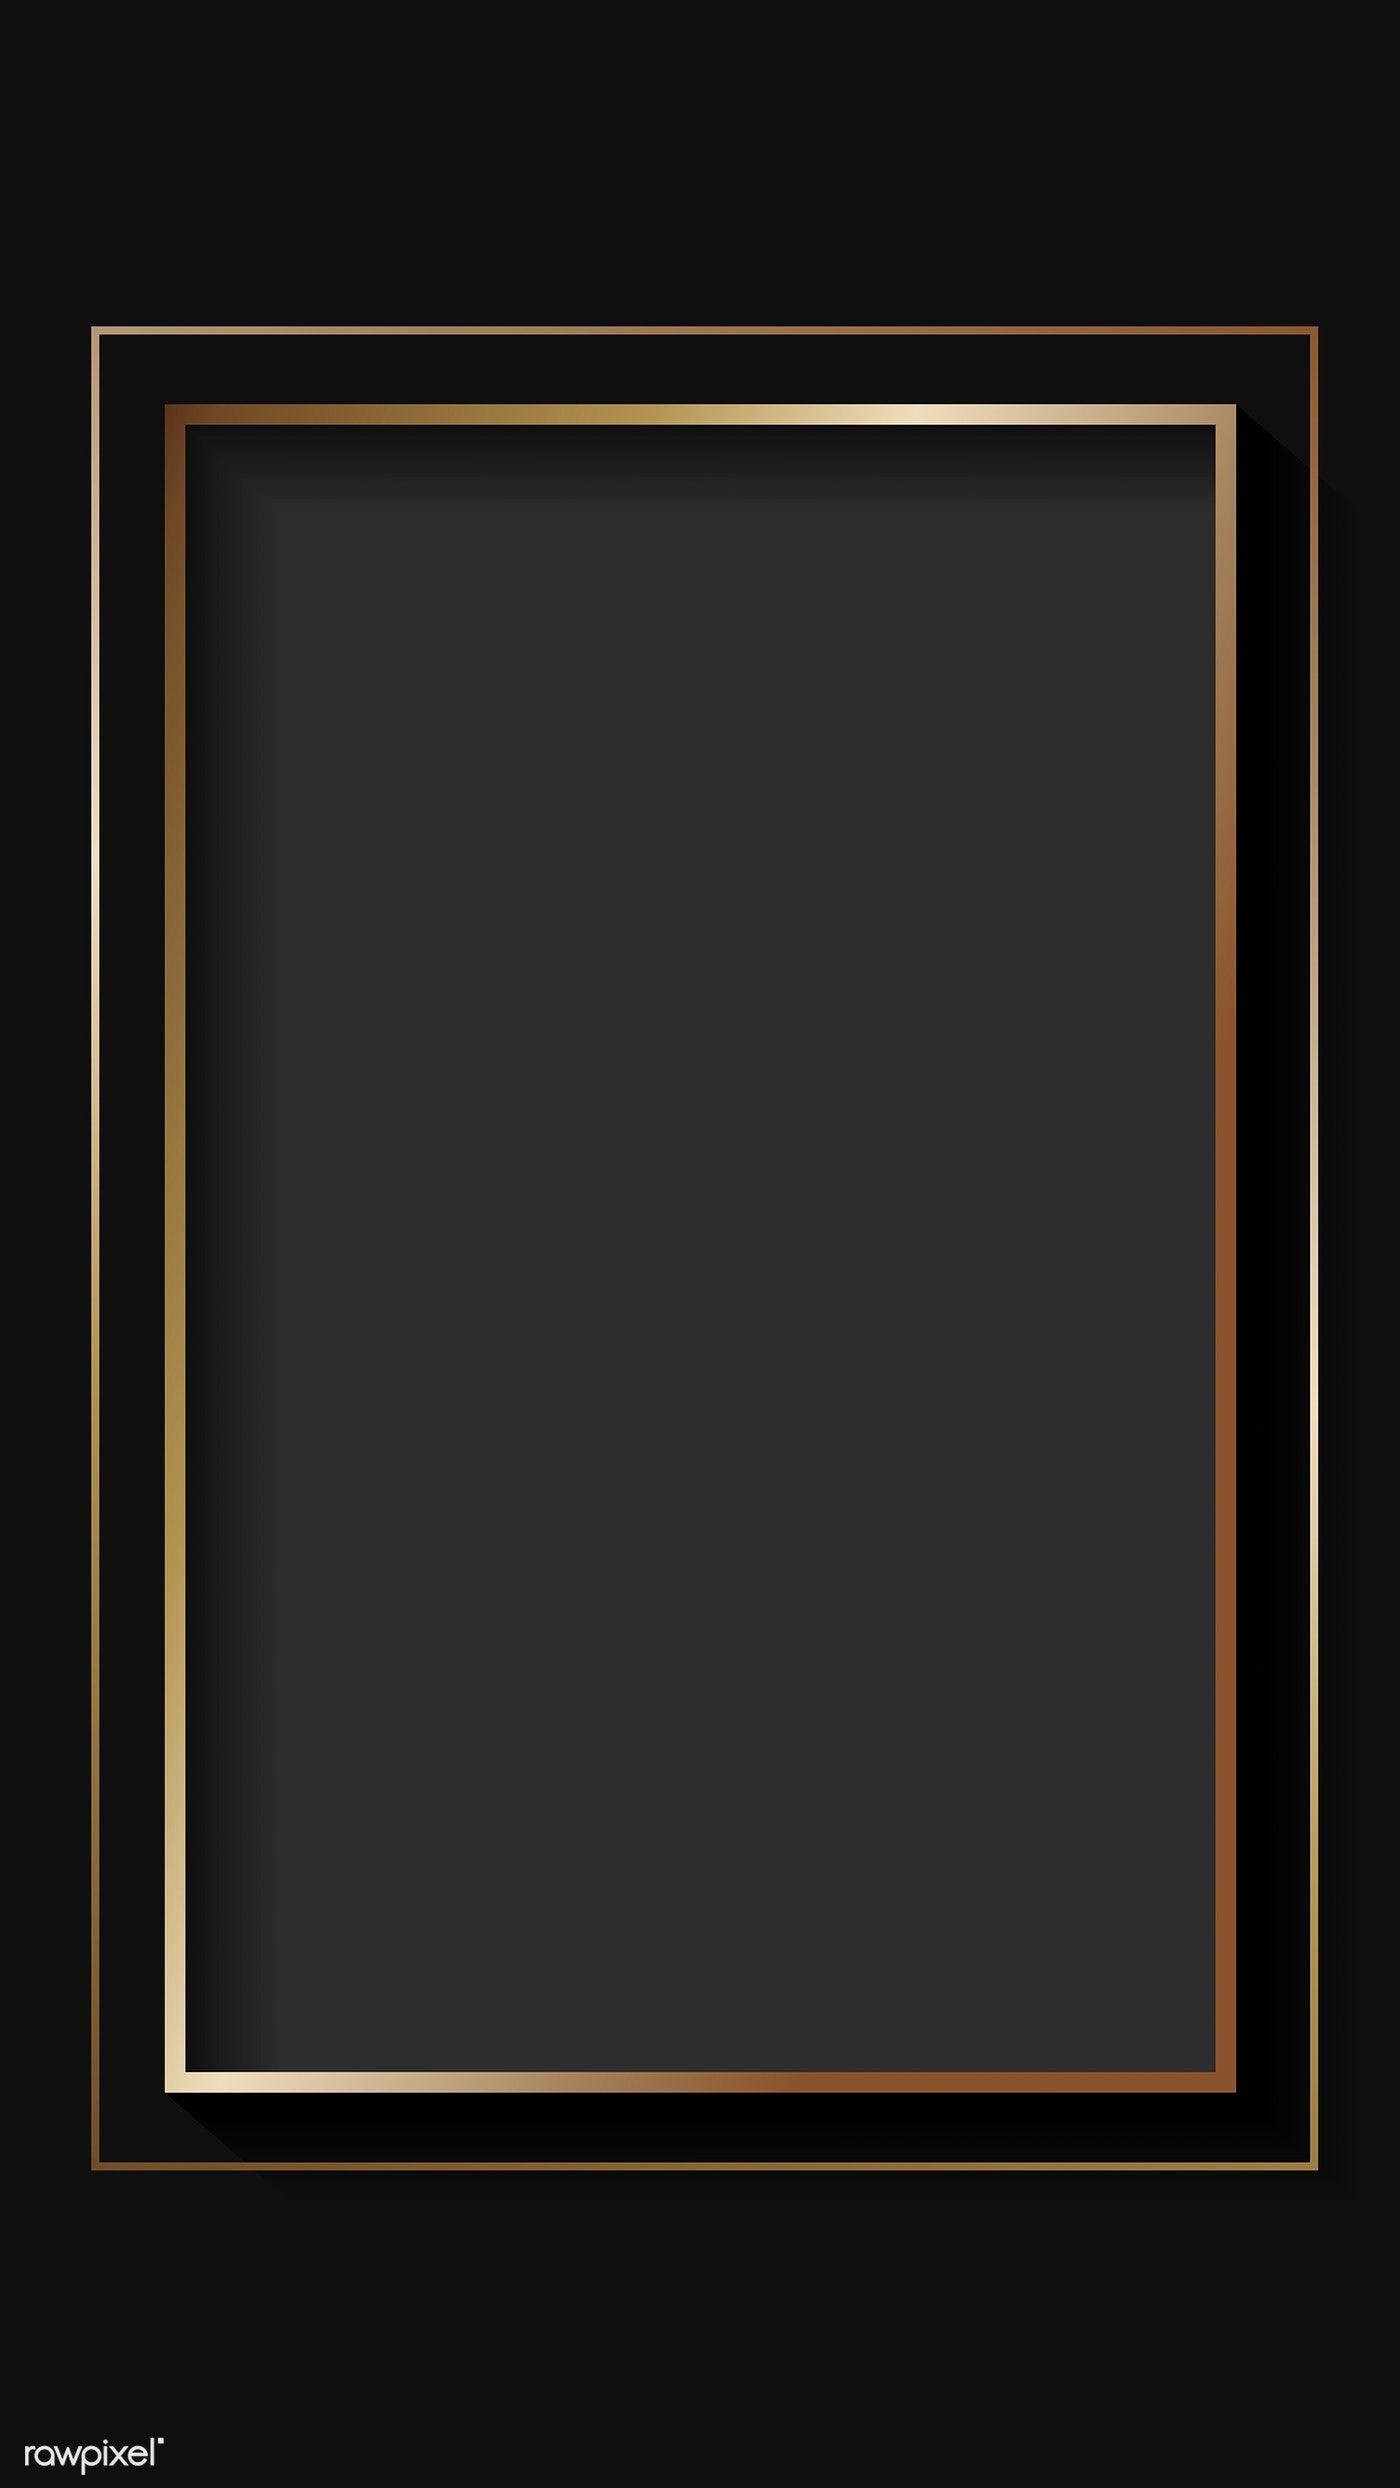 Download Premium Vector Of Blank Rectangle Black Abstract Frame Vector Black Abstract Frame Border Design Poster Background Design